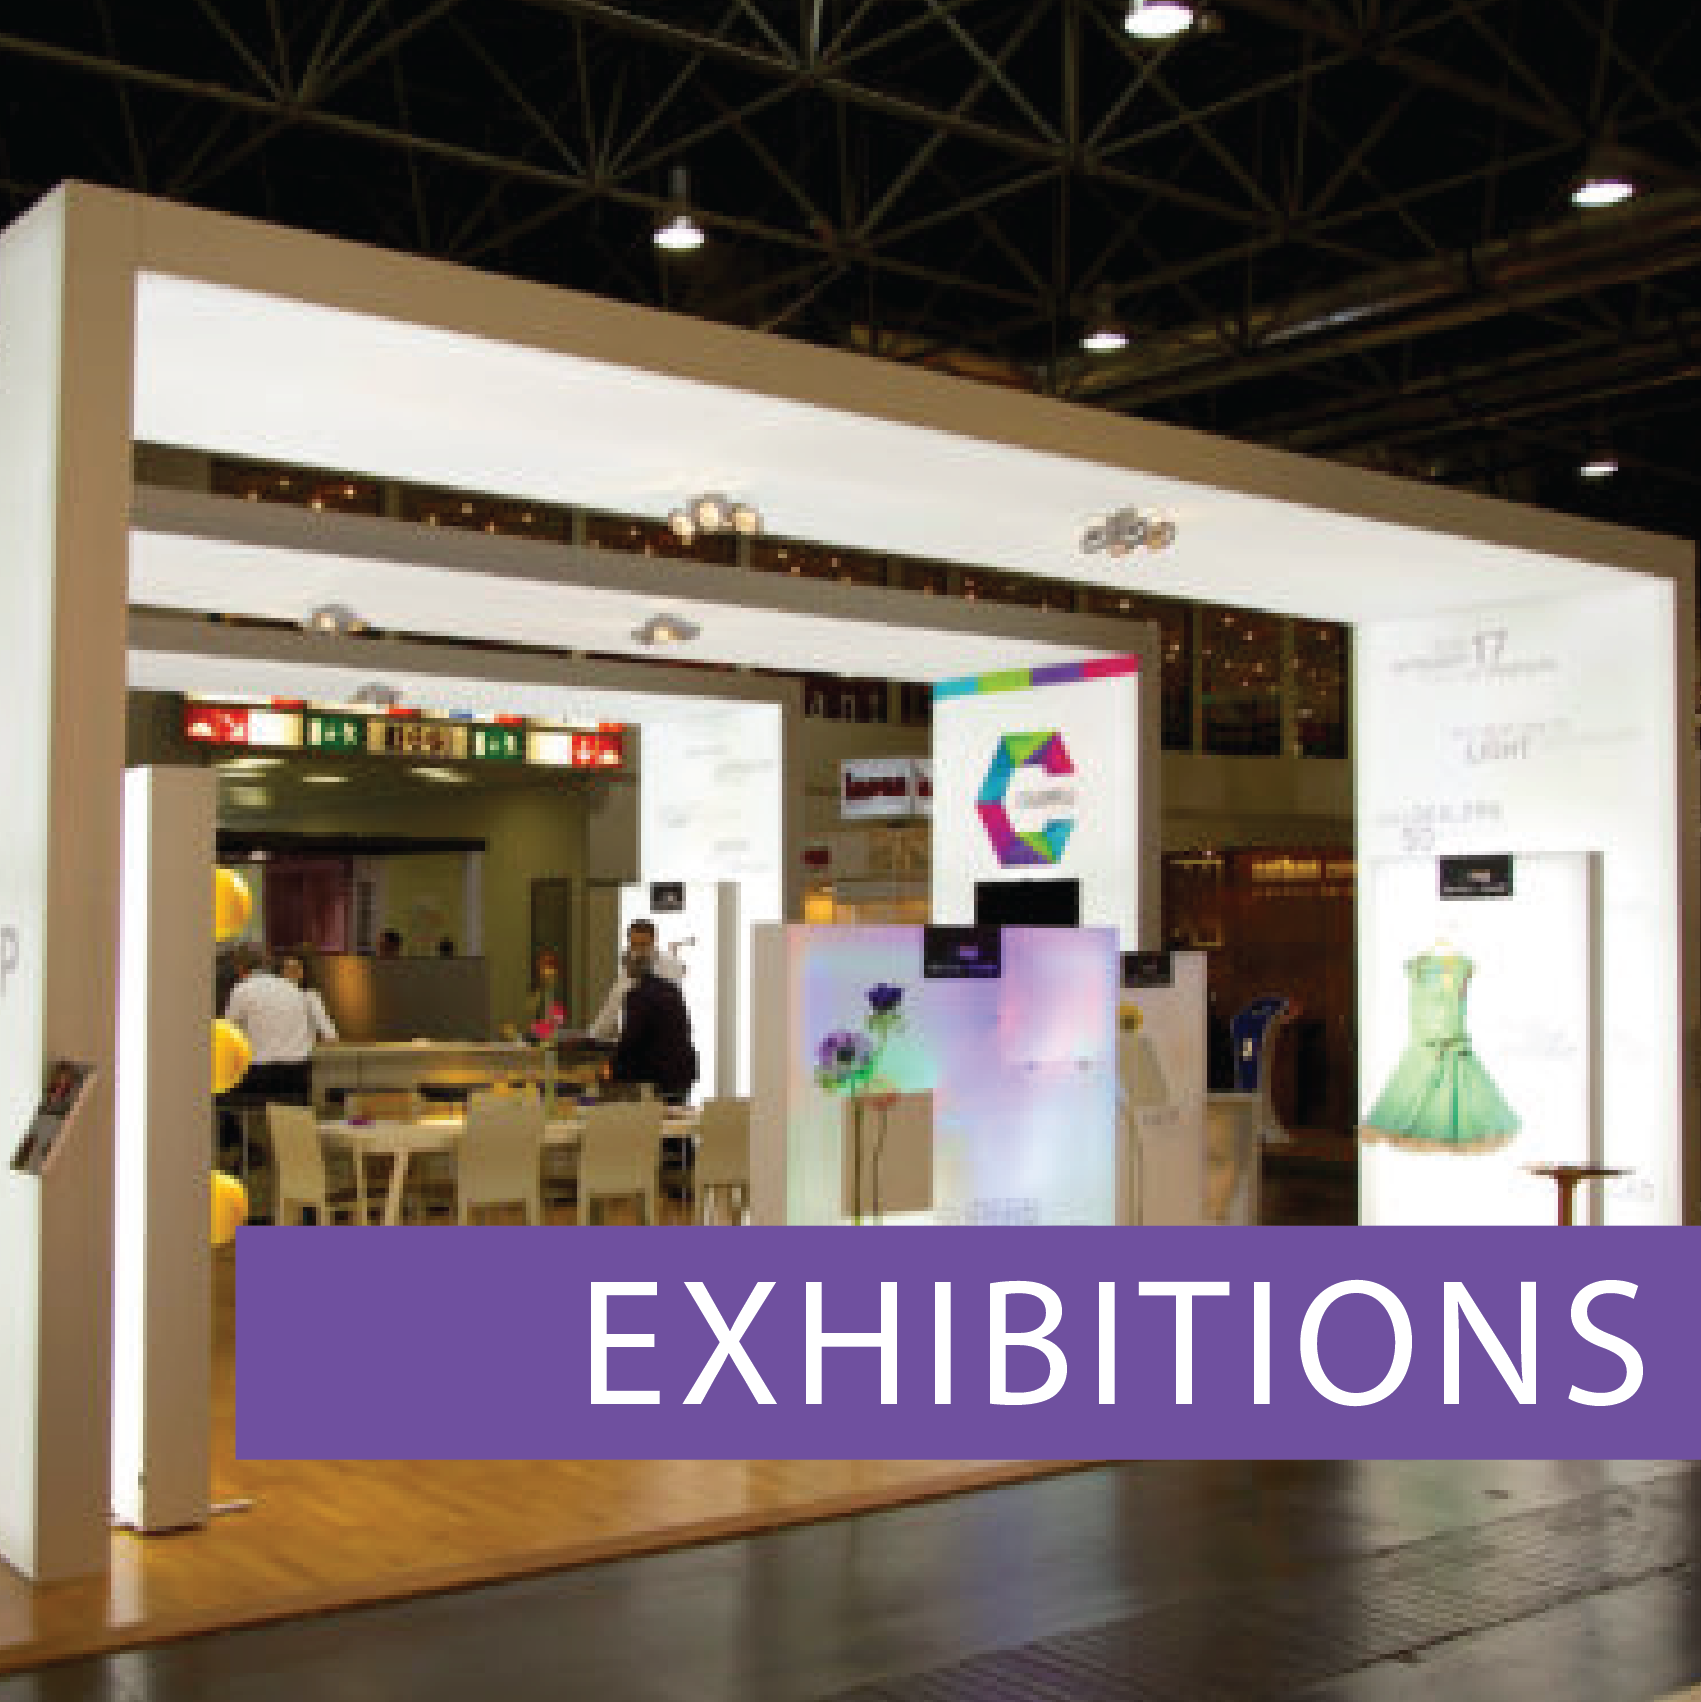 Matrix Frame Exhibition Displays